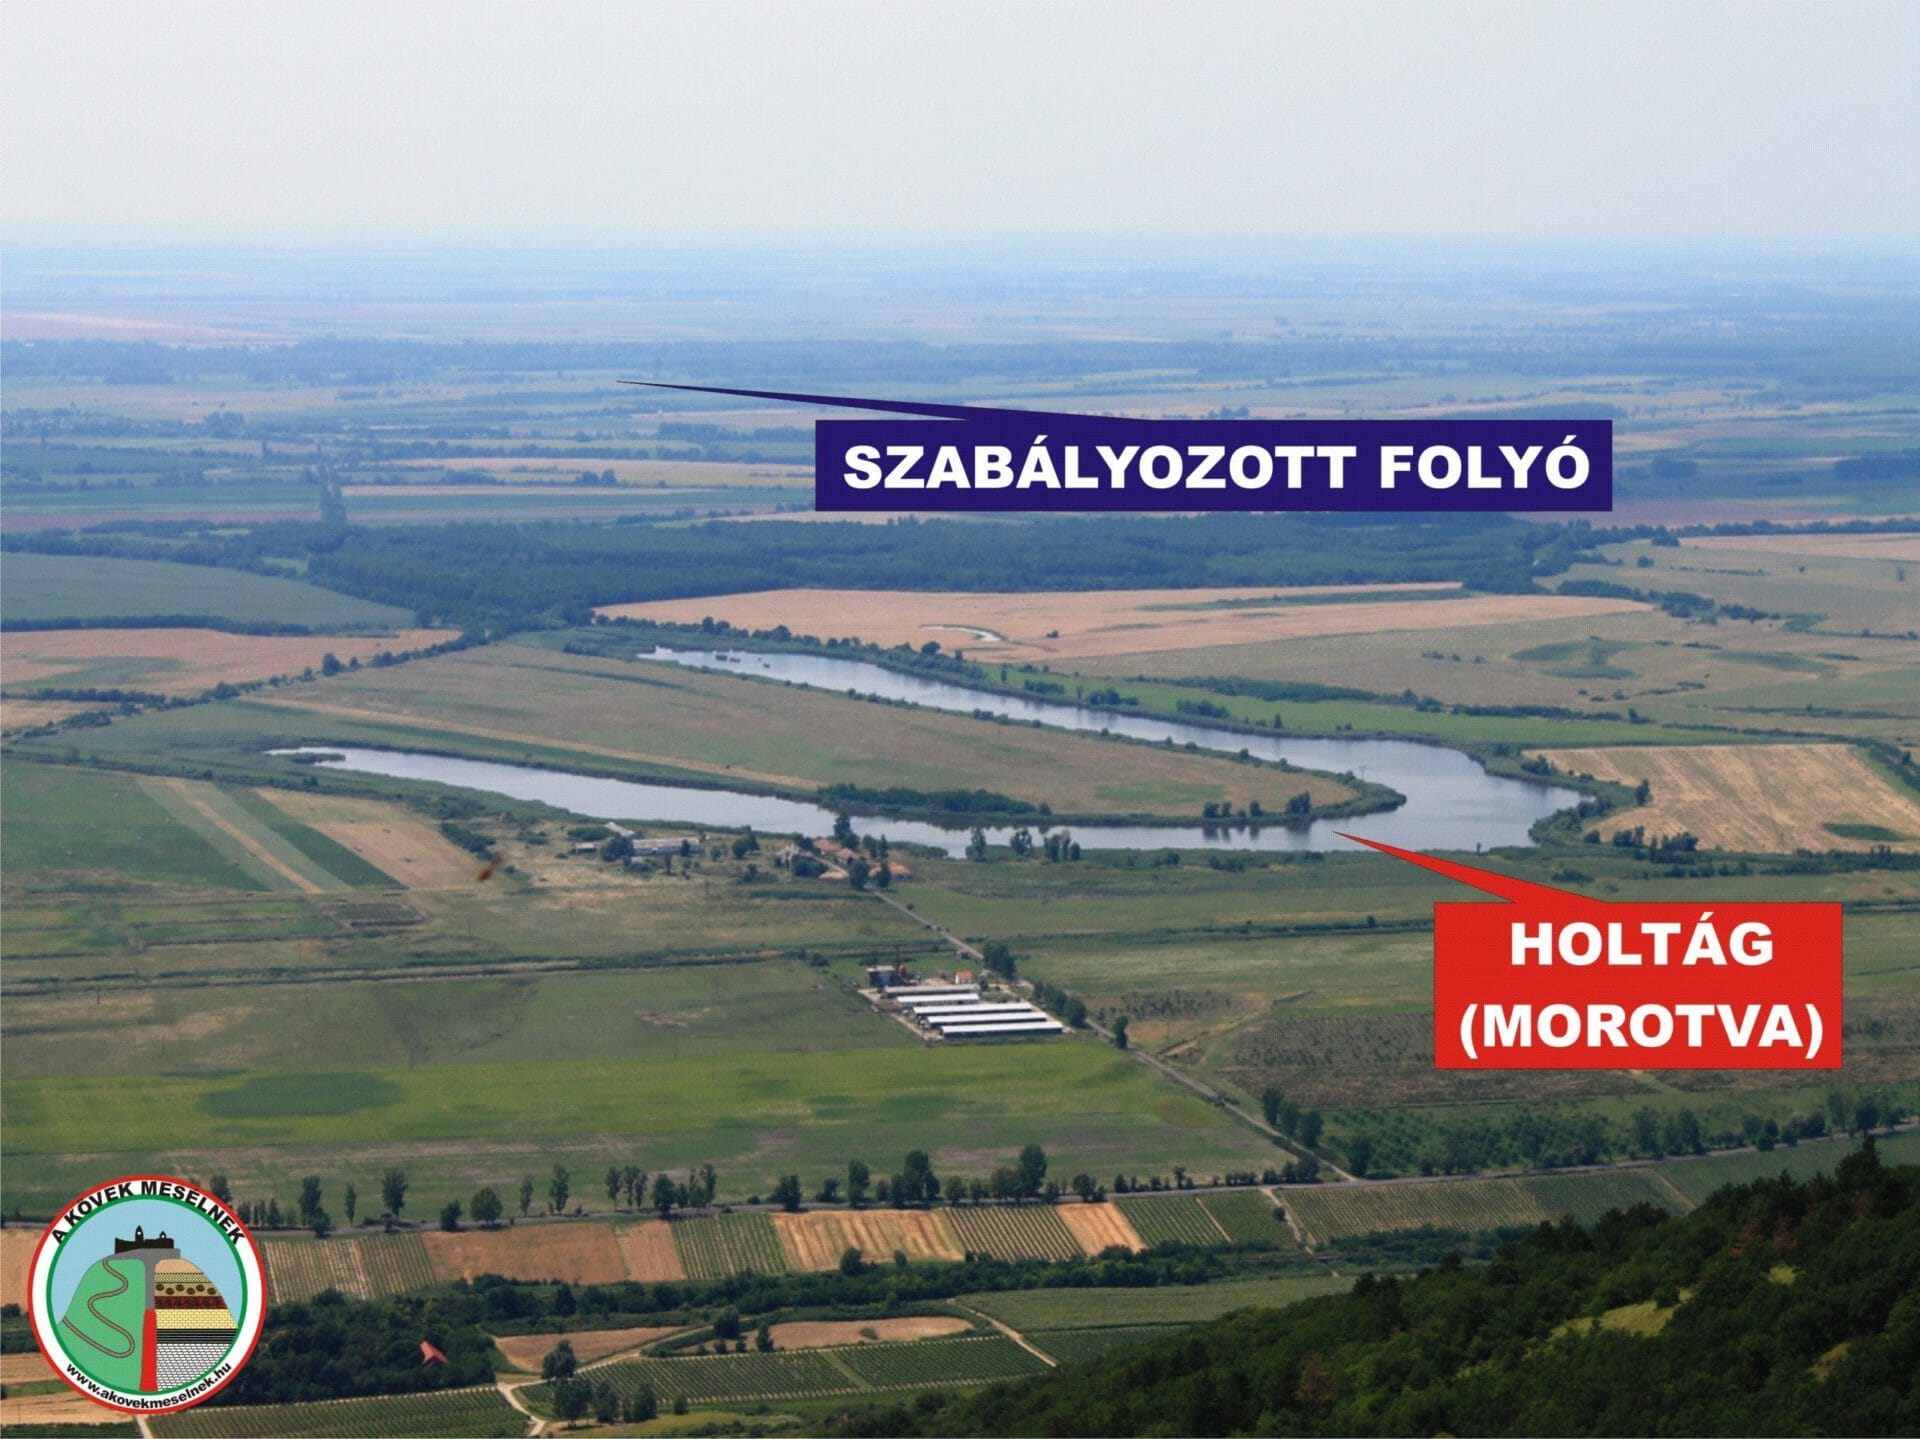 Morotva (hidroszféra)